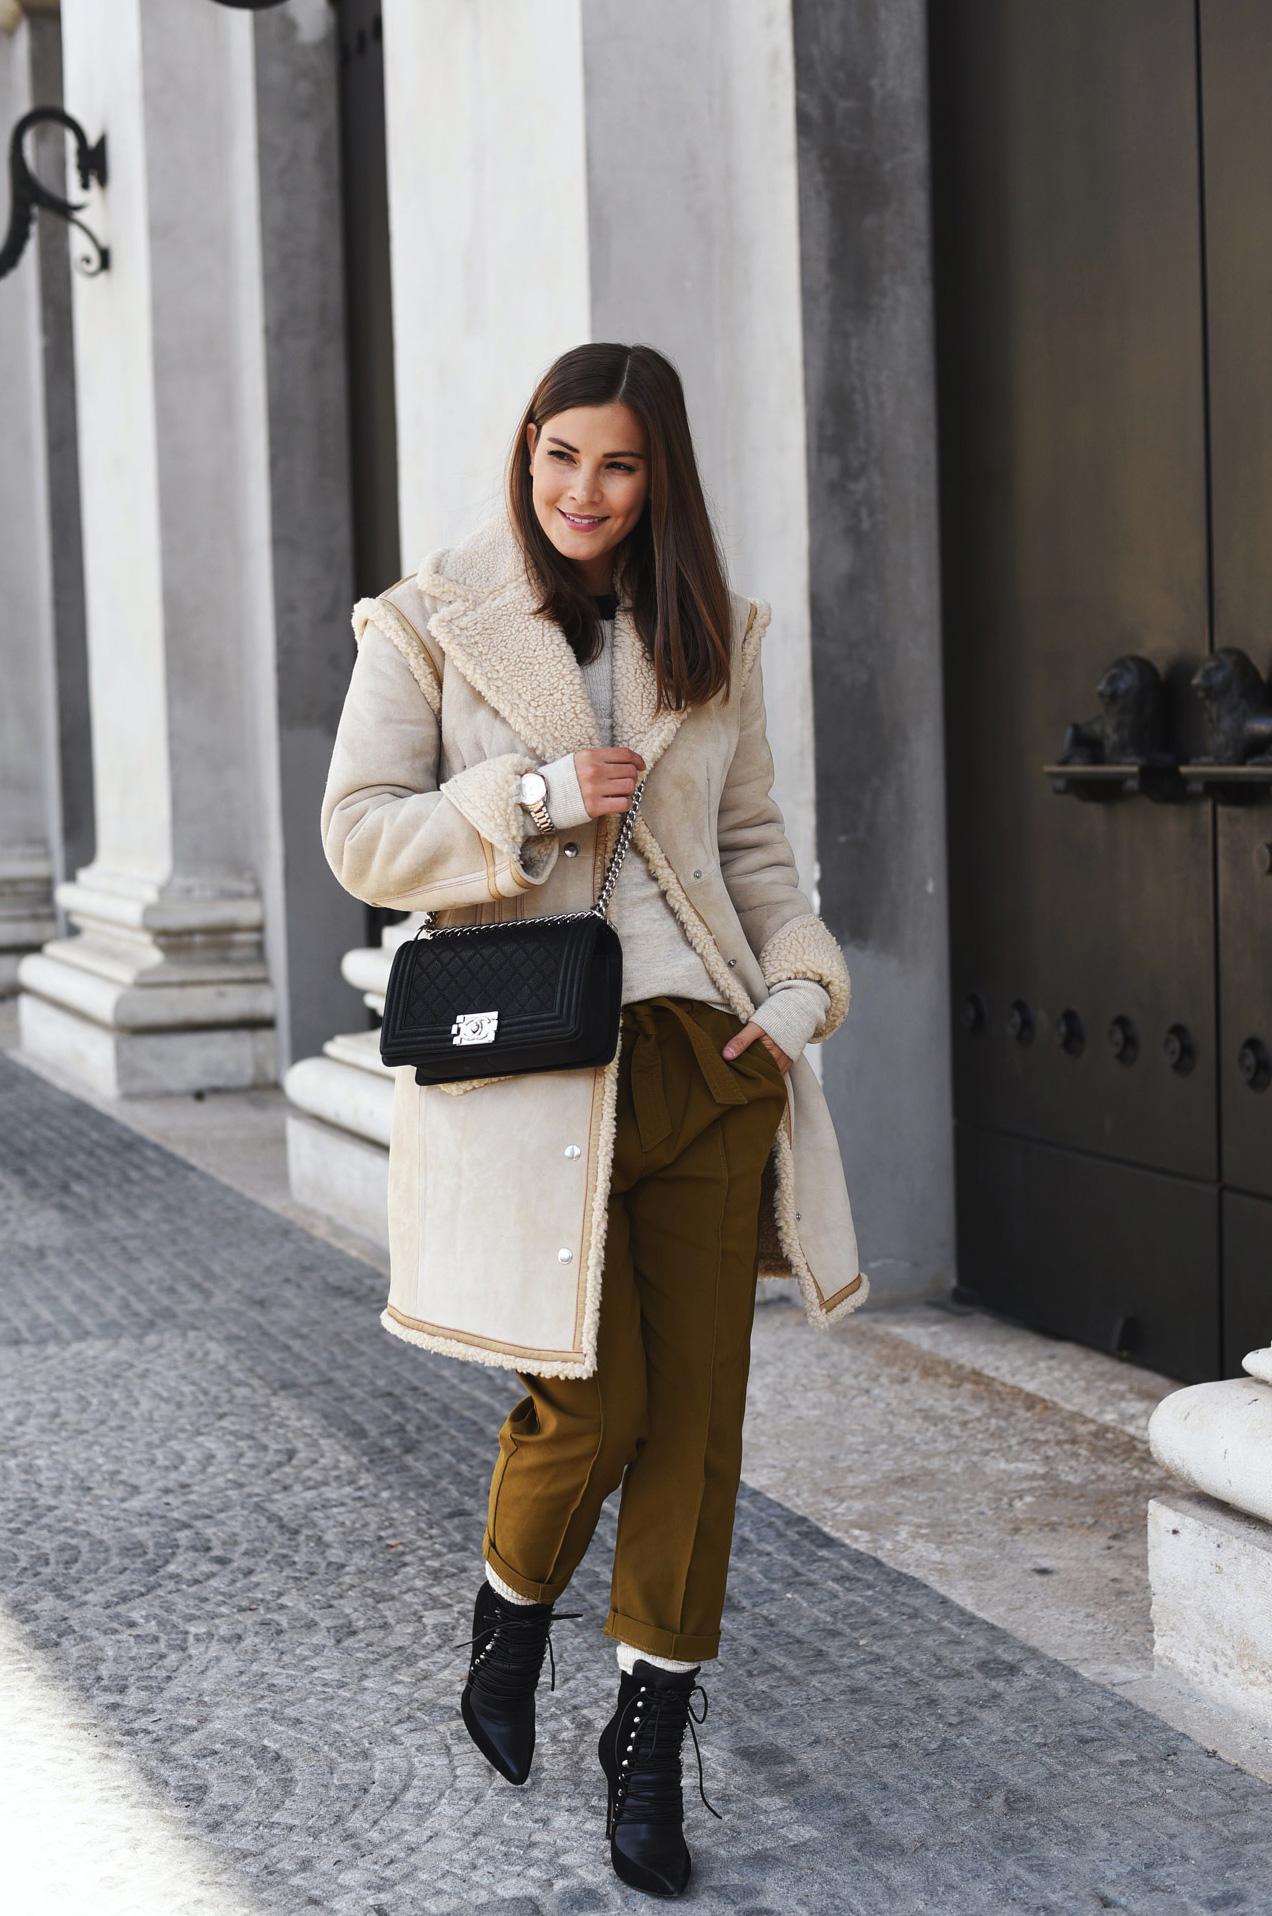 fashionblog-from-germany-high-quality-munich-fashiioncarpet